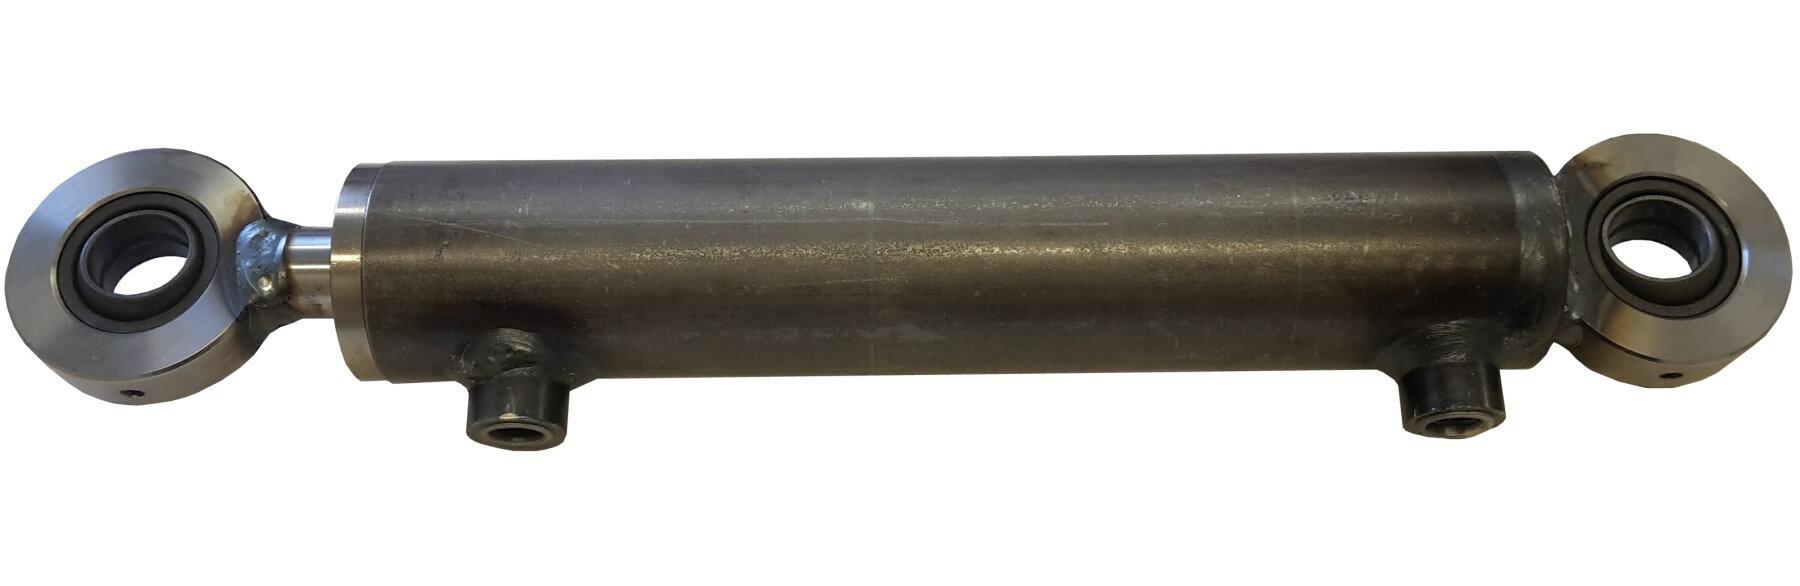 Hydraulisylinteri CL 50. 25. 100 GE